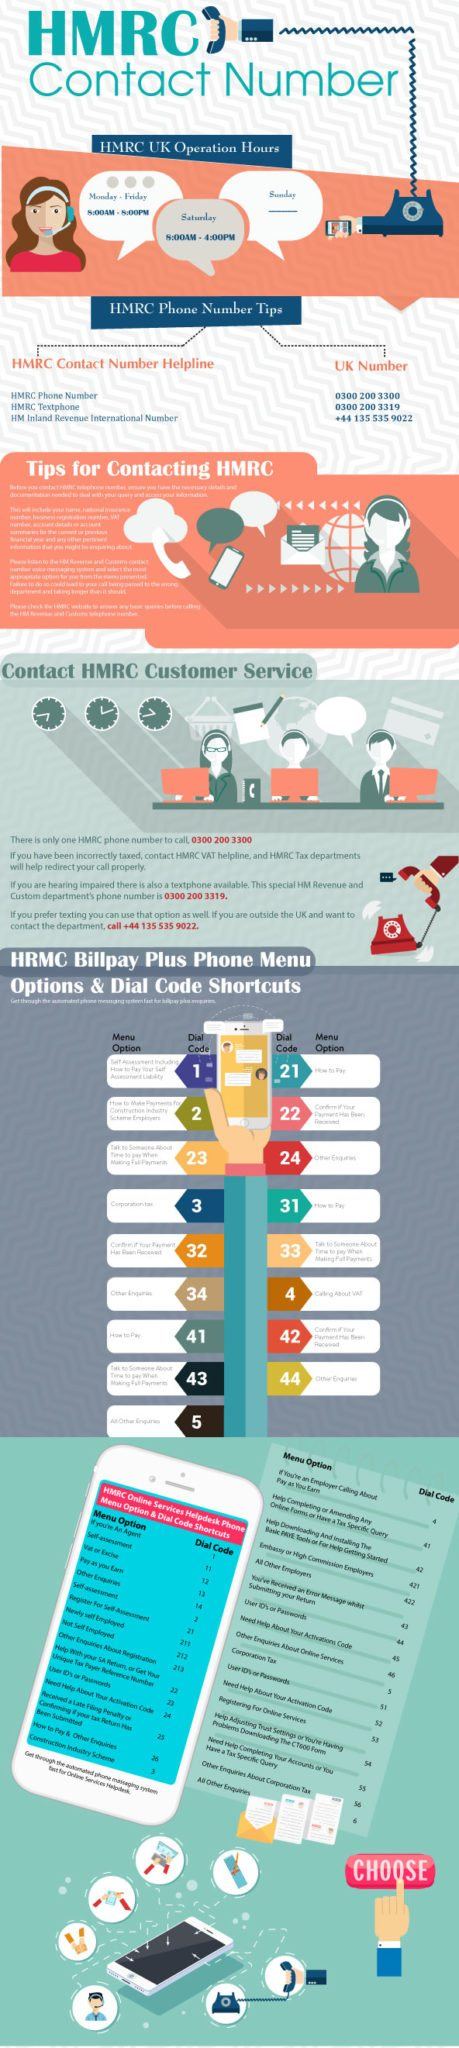 HMRC Contact Number